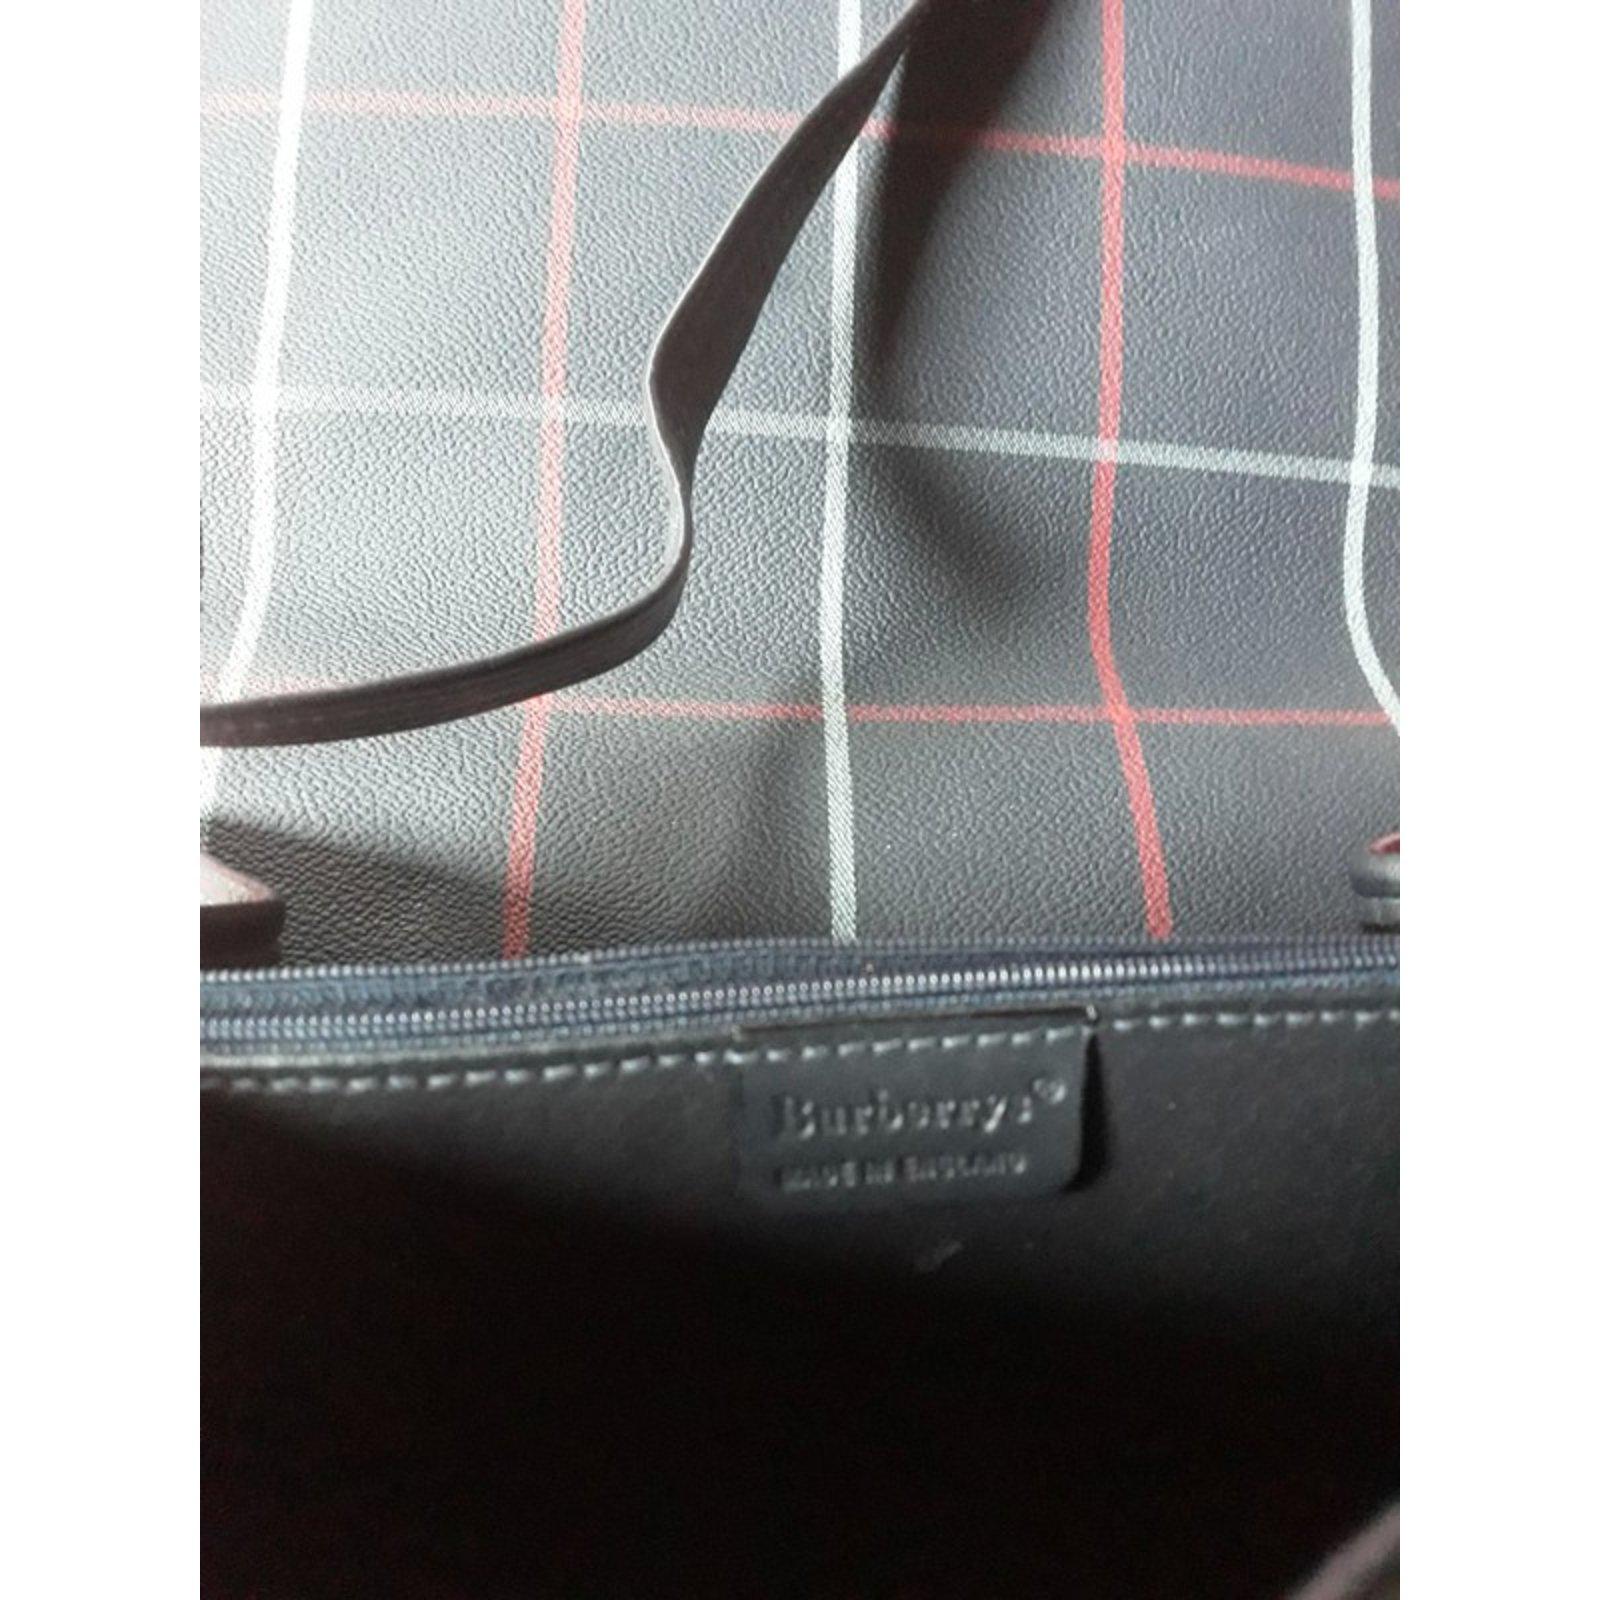 04f1b6dddac4 Burberry Hand bags Handbags Leather Dark blue ref.85327 - Joli Closet